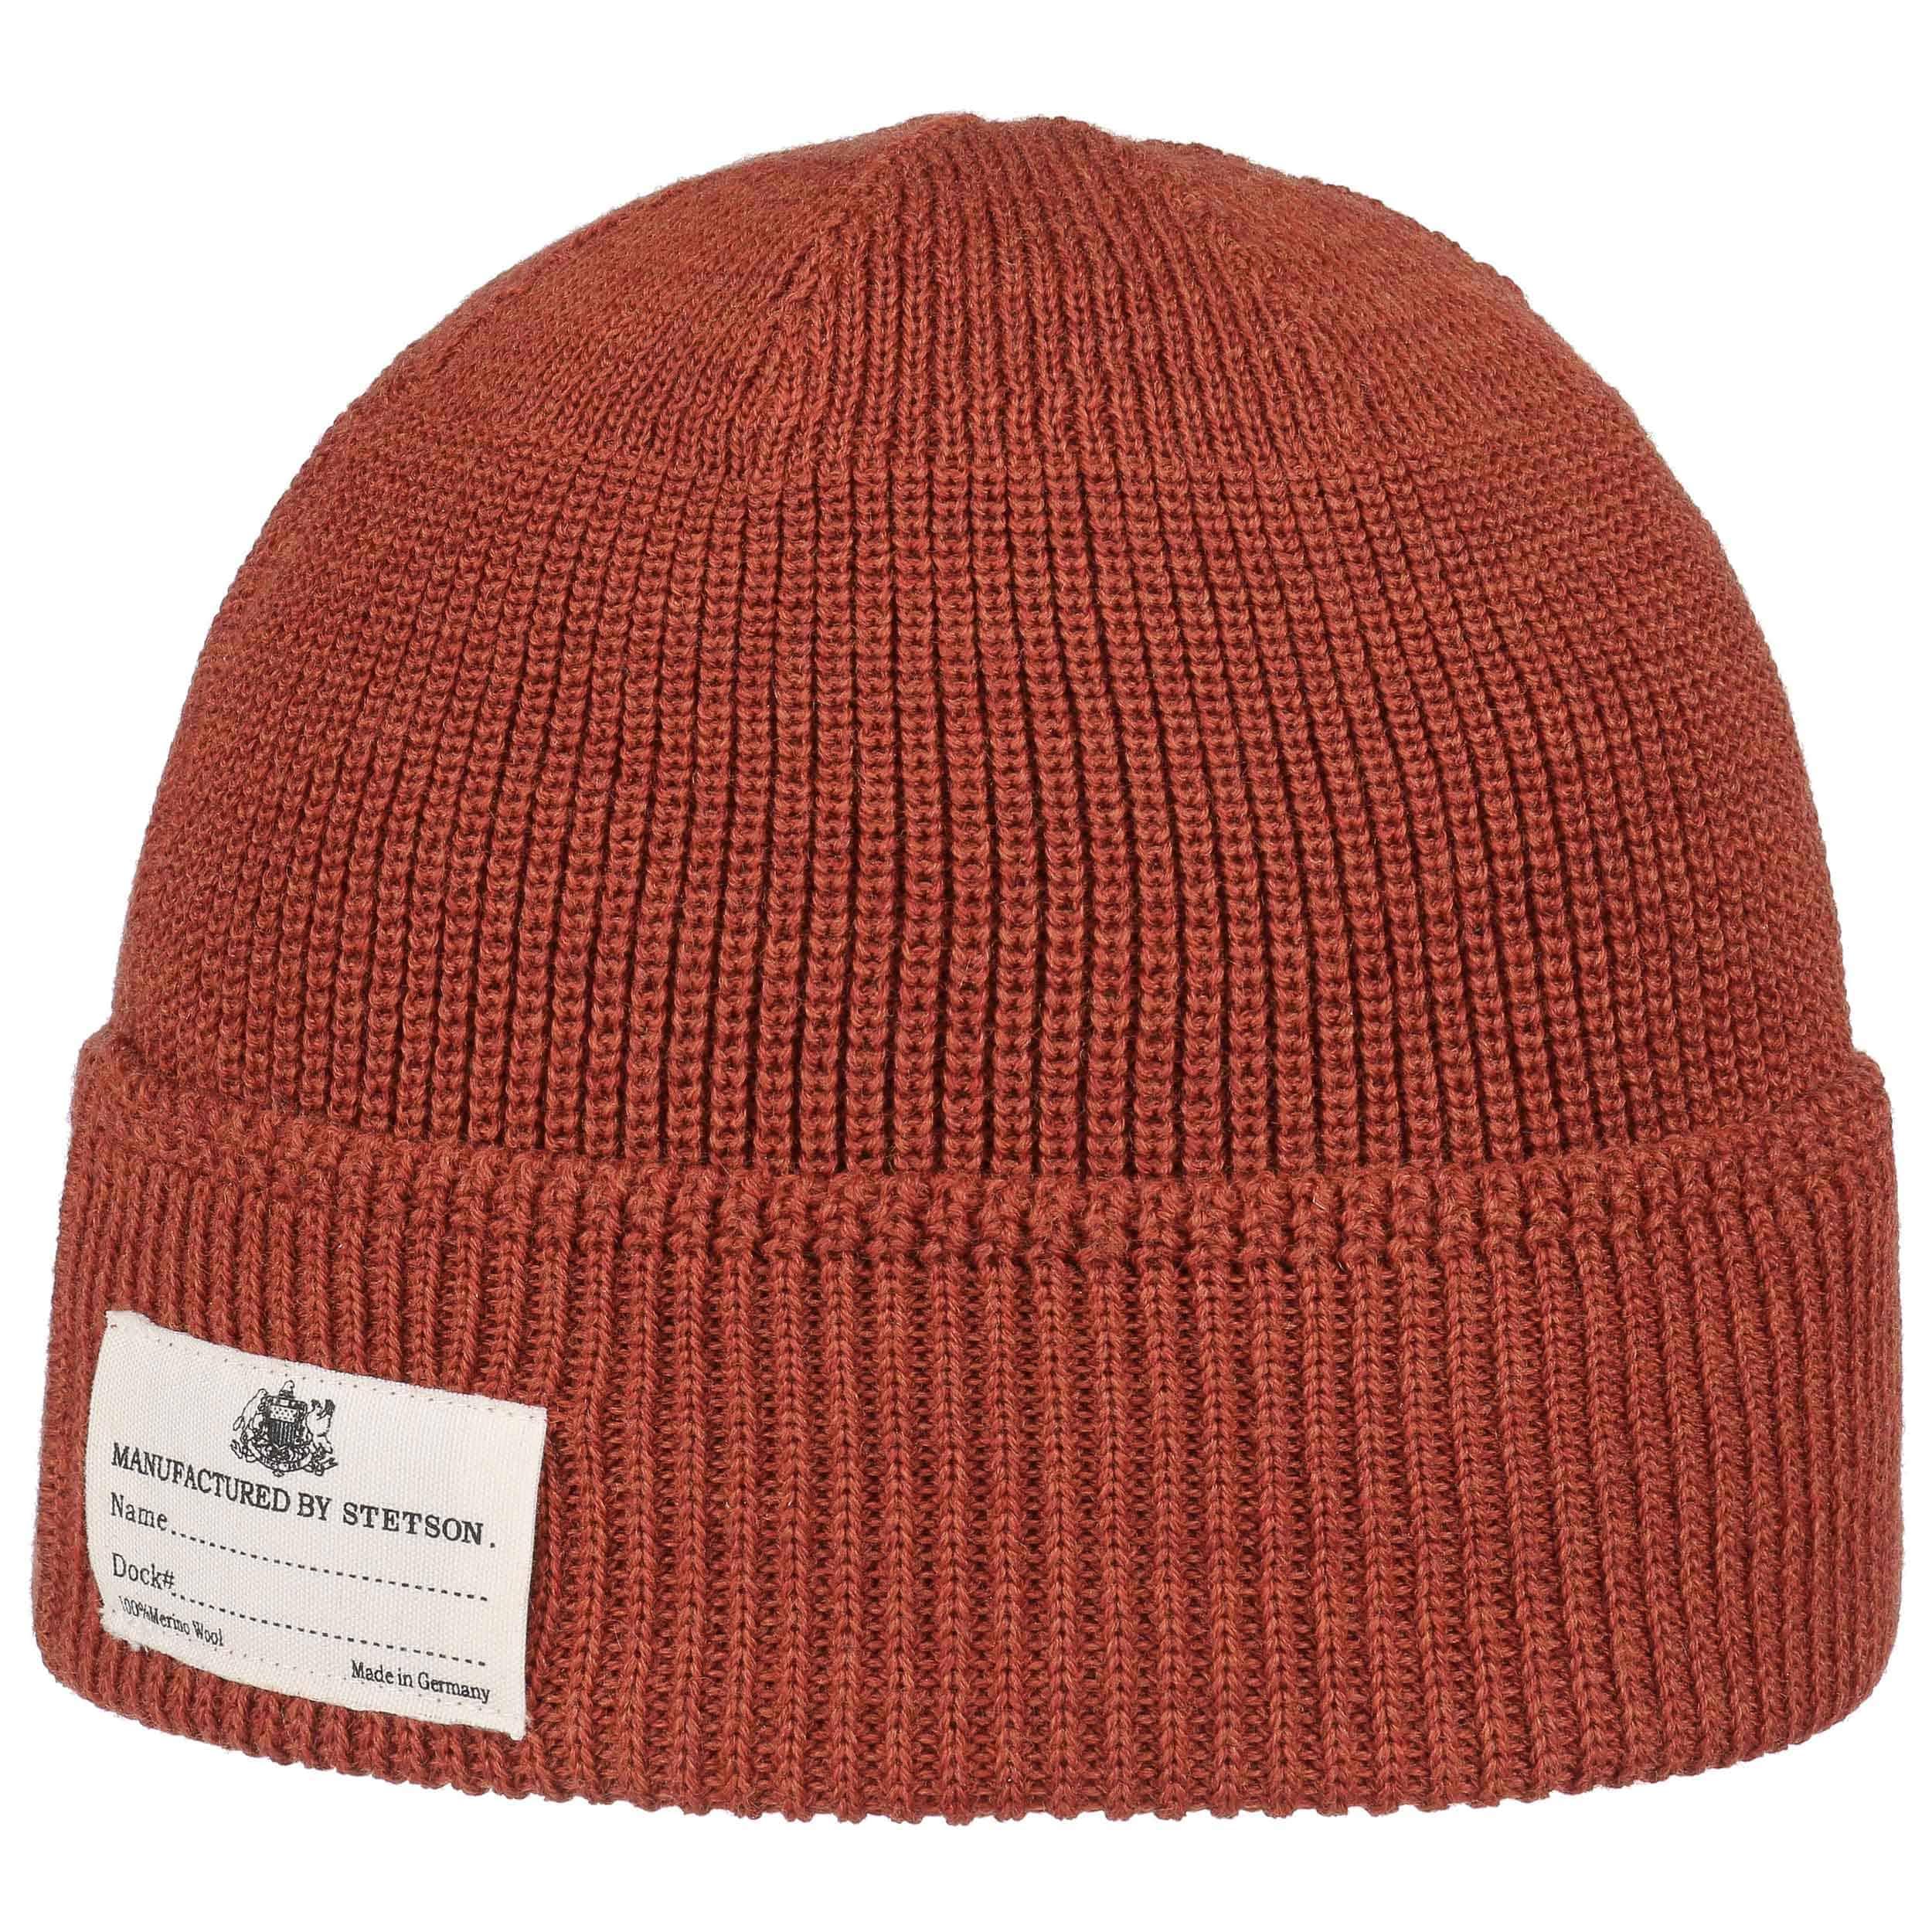 2f14df7c519 ... black 1 · Onalaska Knit Hat with Cuff by Stetson - orange 3